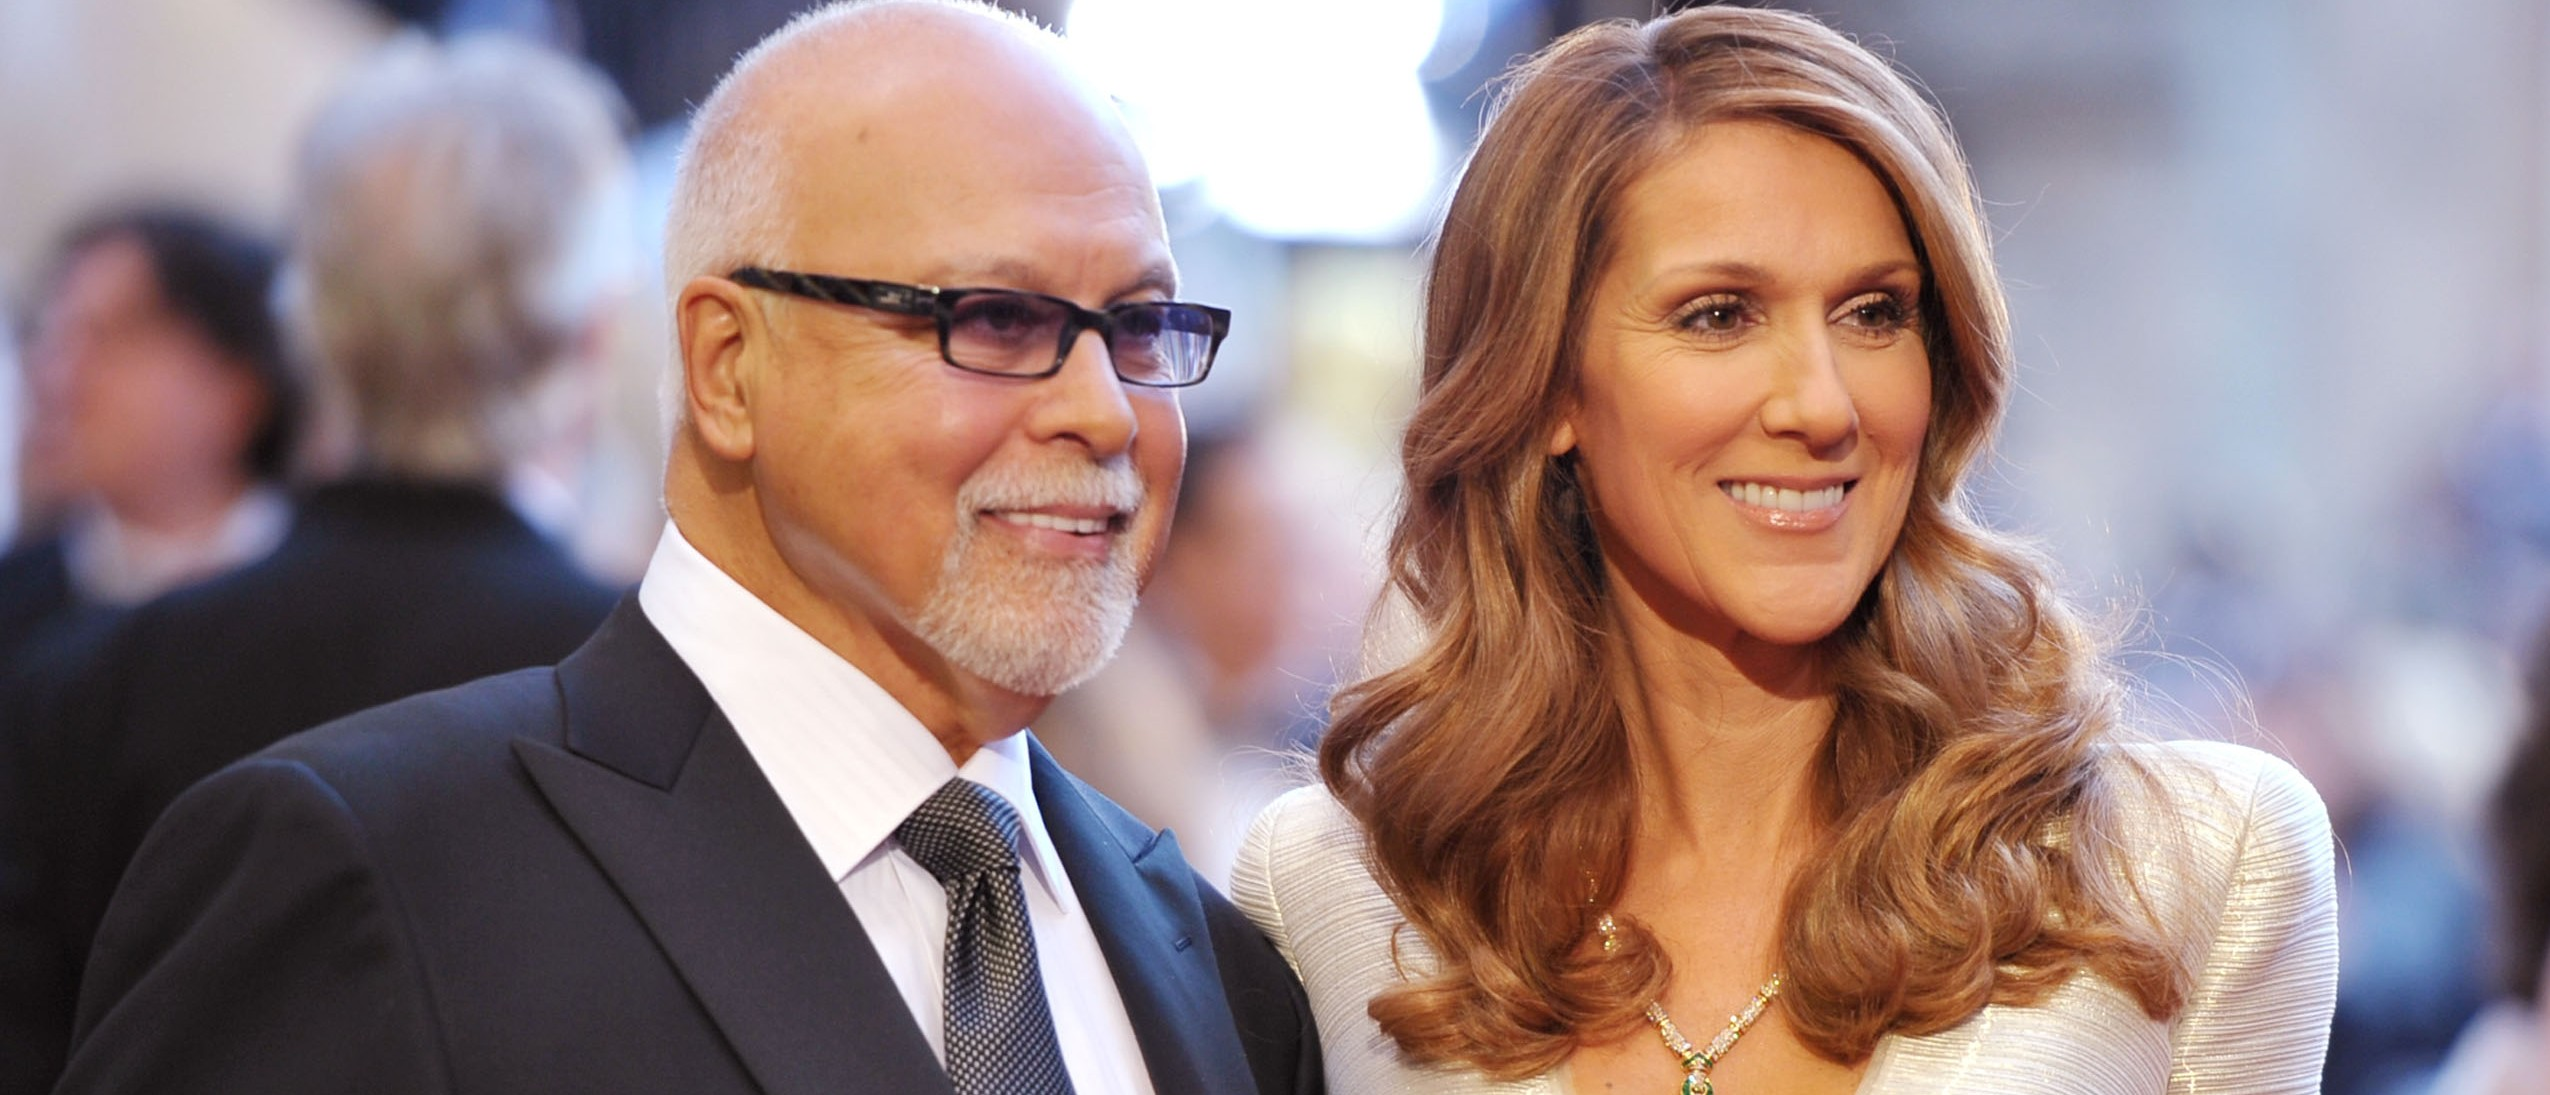 Celine Dion's husband dies. (Photo: John Shearer/Getty Images)